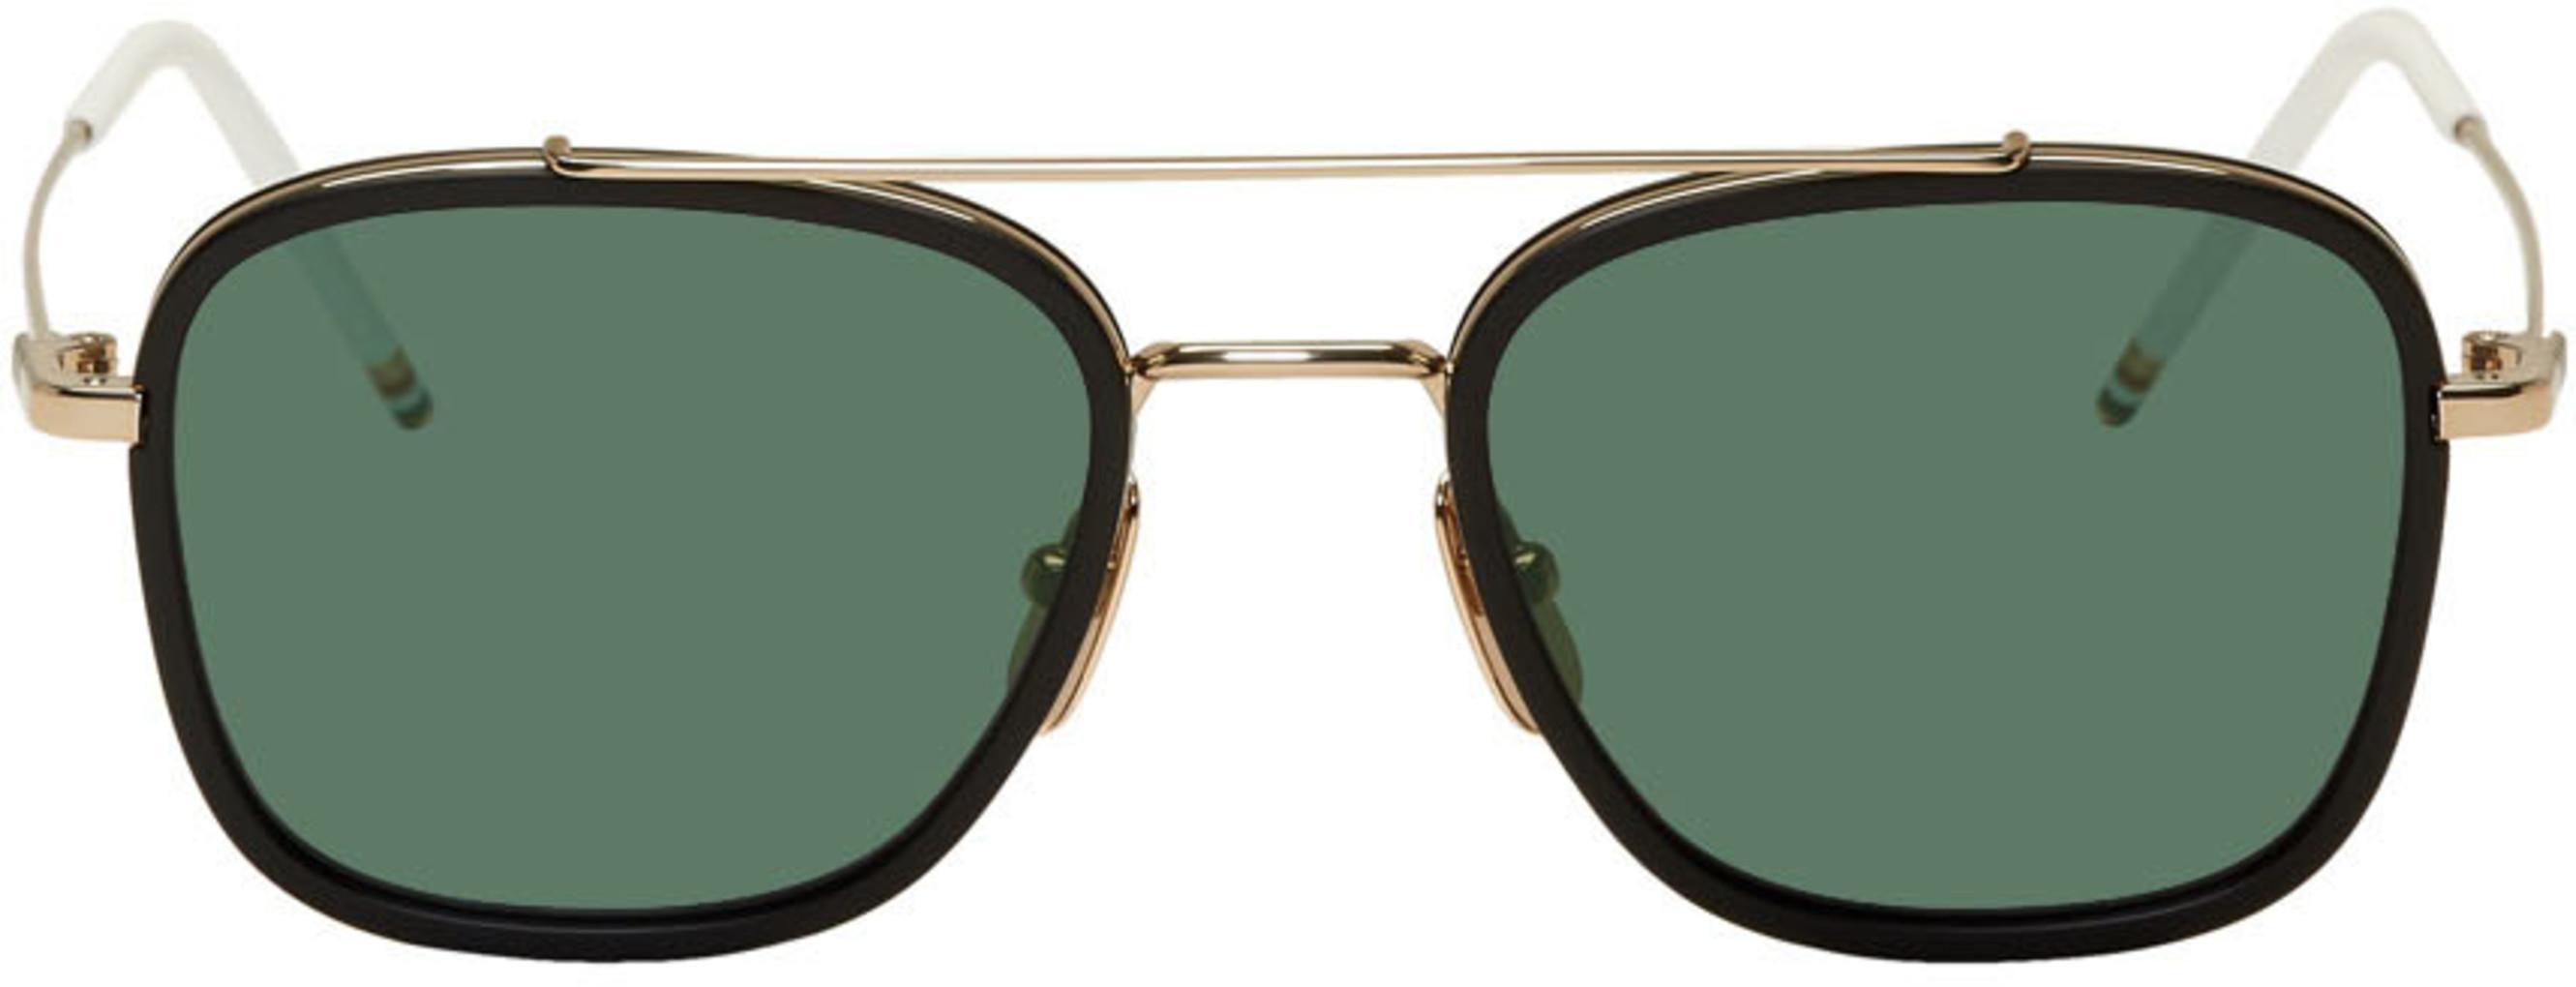 172fac3f4d8a Thom Browne sunglasses for Men | SSENSE